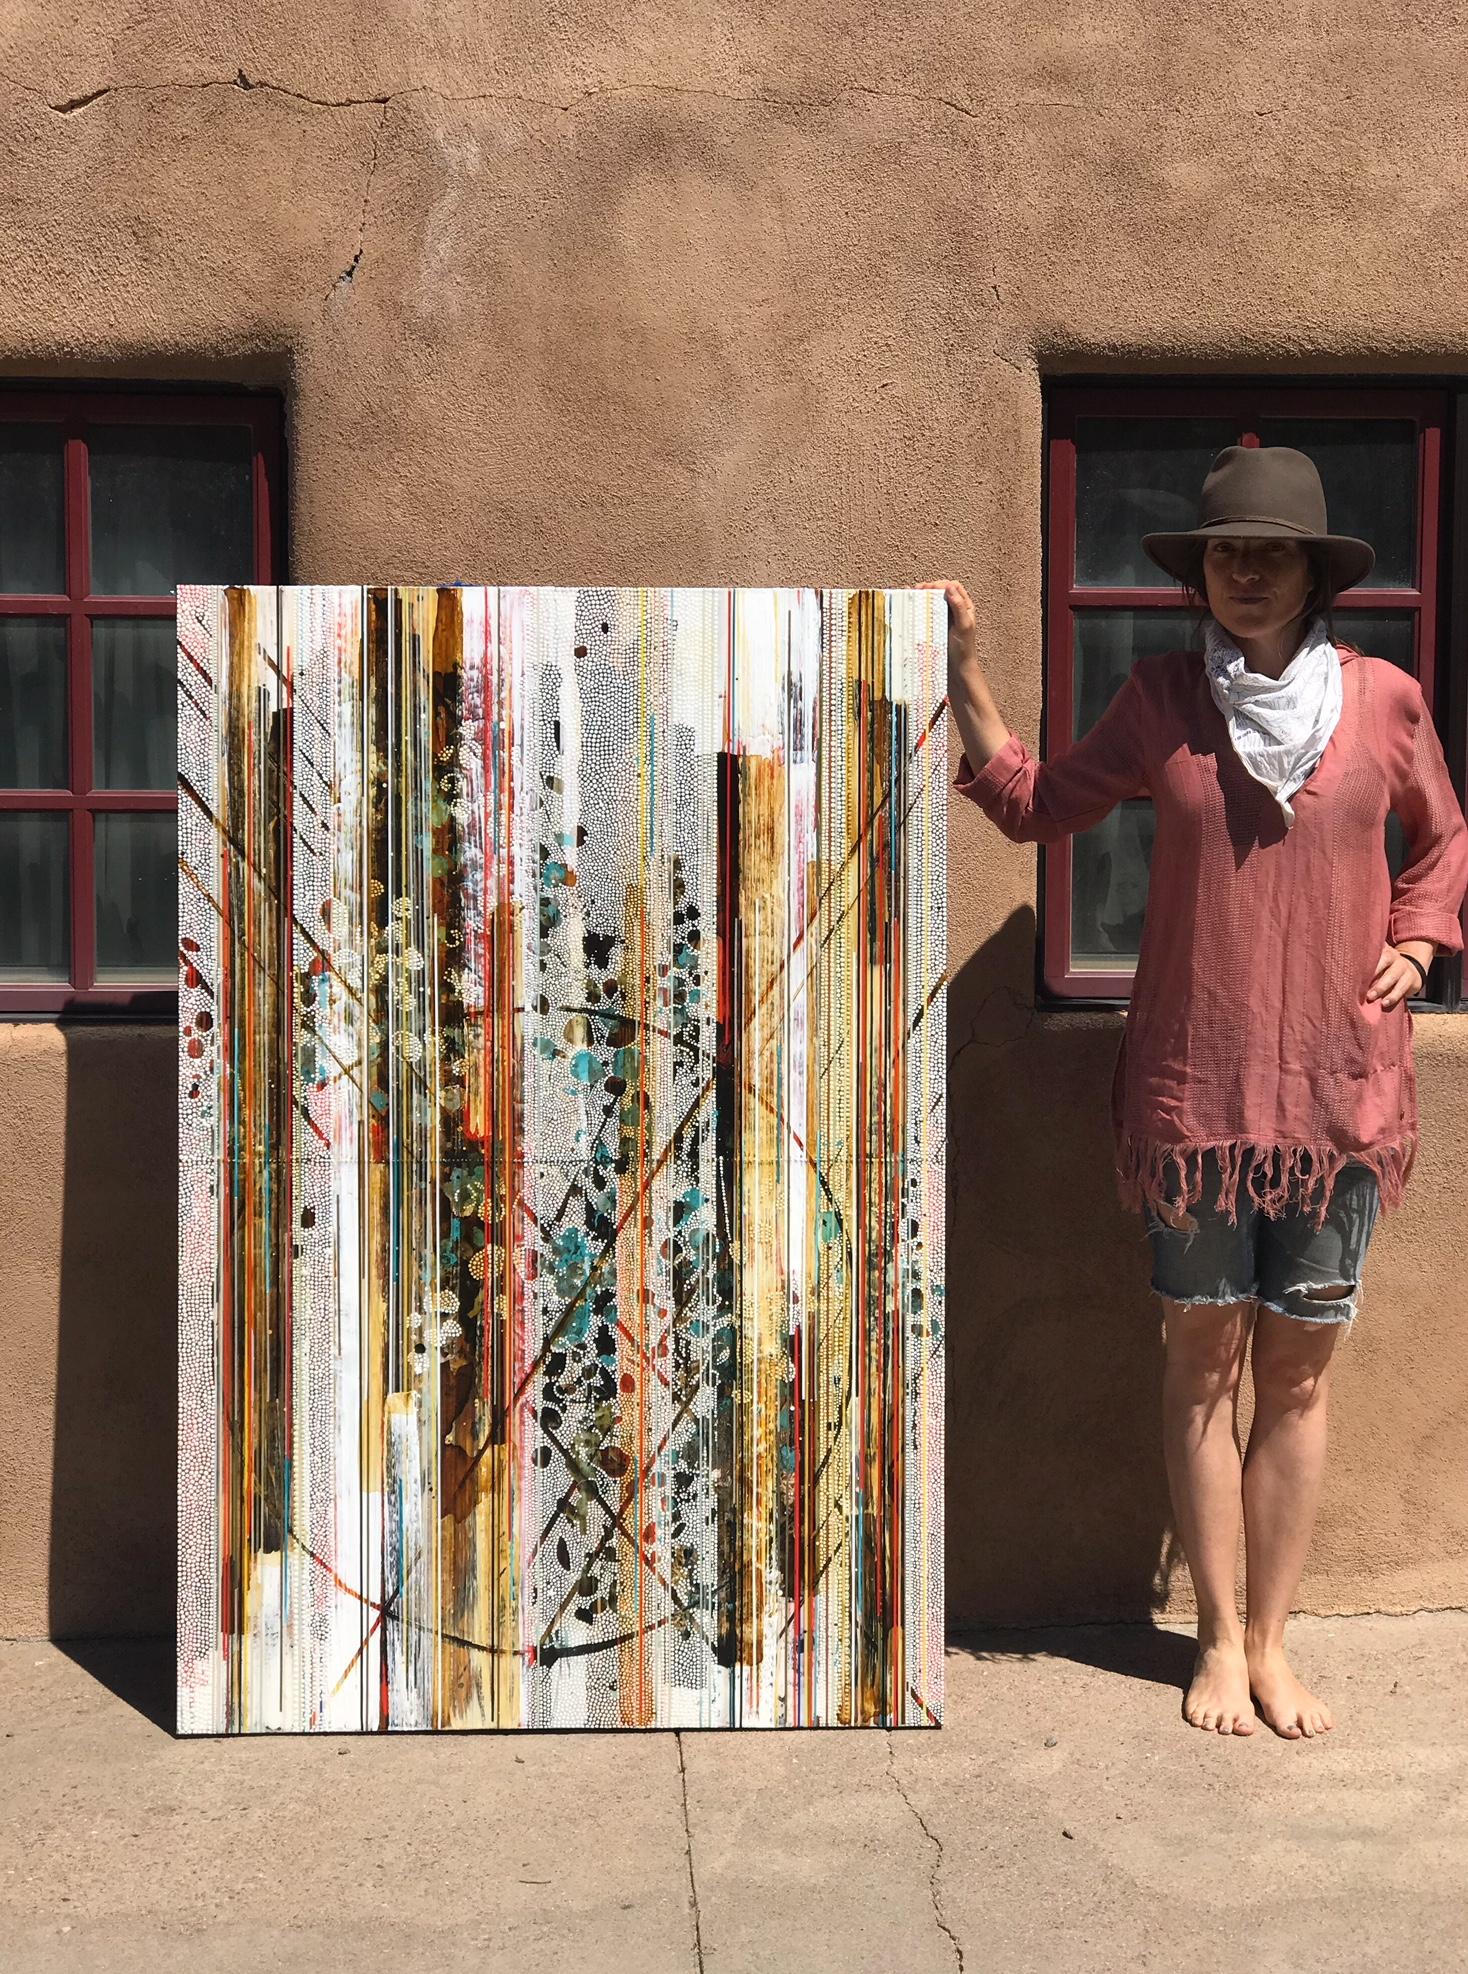 Outside her Santa Fe studio, Nina Tichava holds one of her works steady for the camera